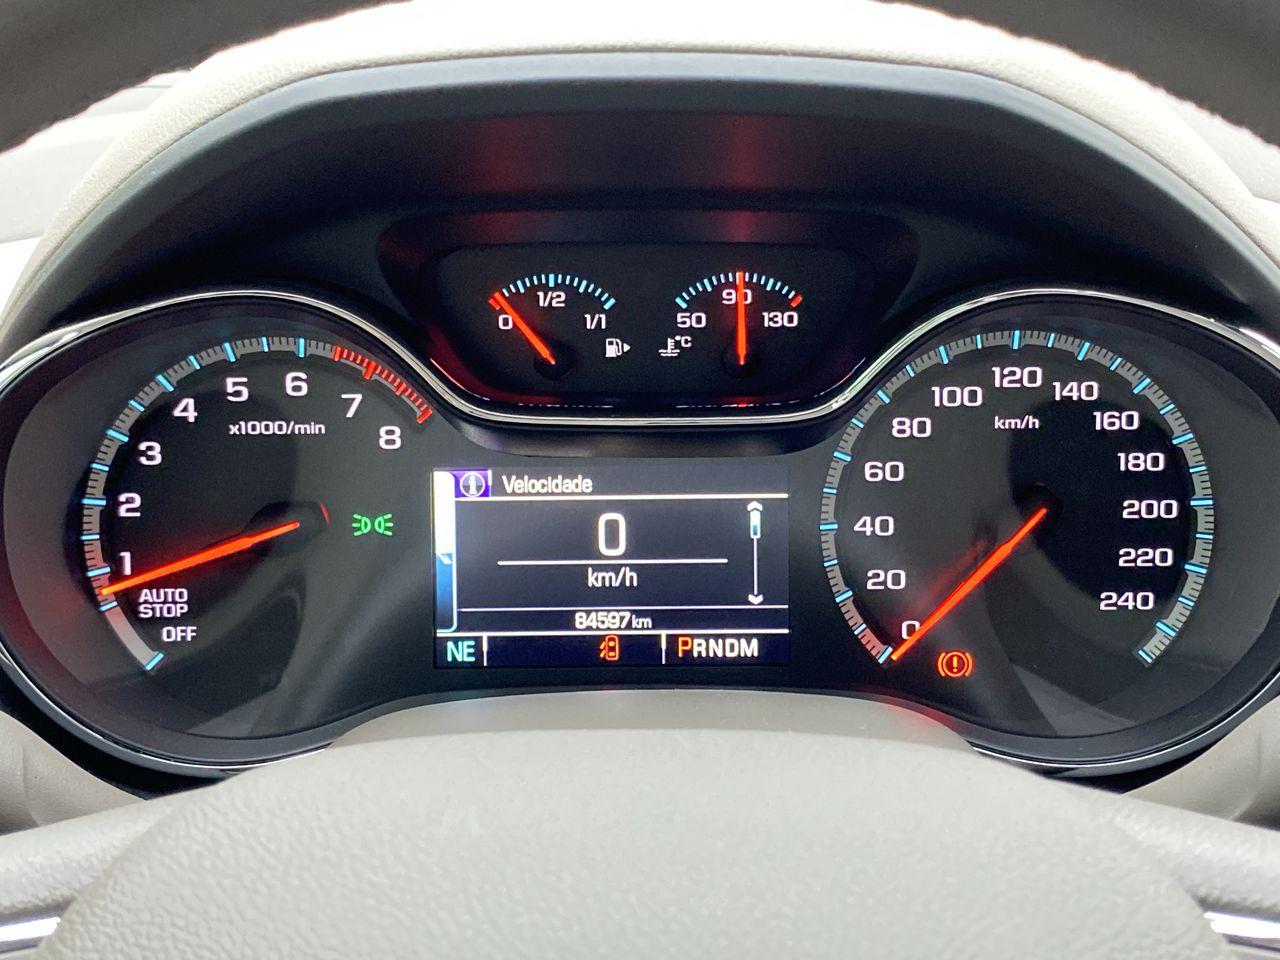 CRUZE LTZ 1.4 16V Turbo Flex 4p Aut.